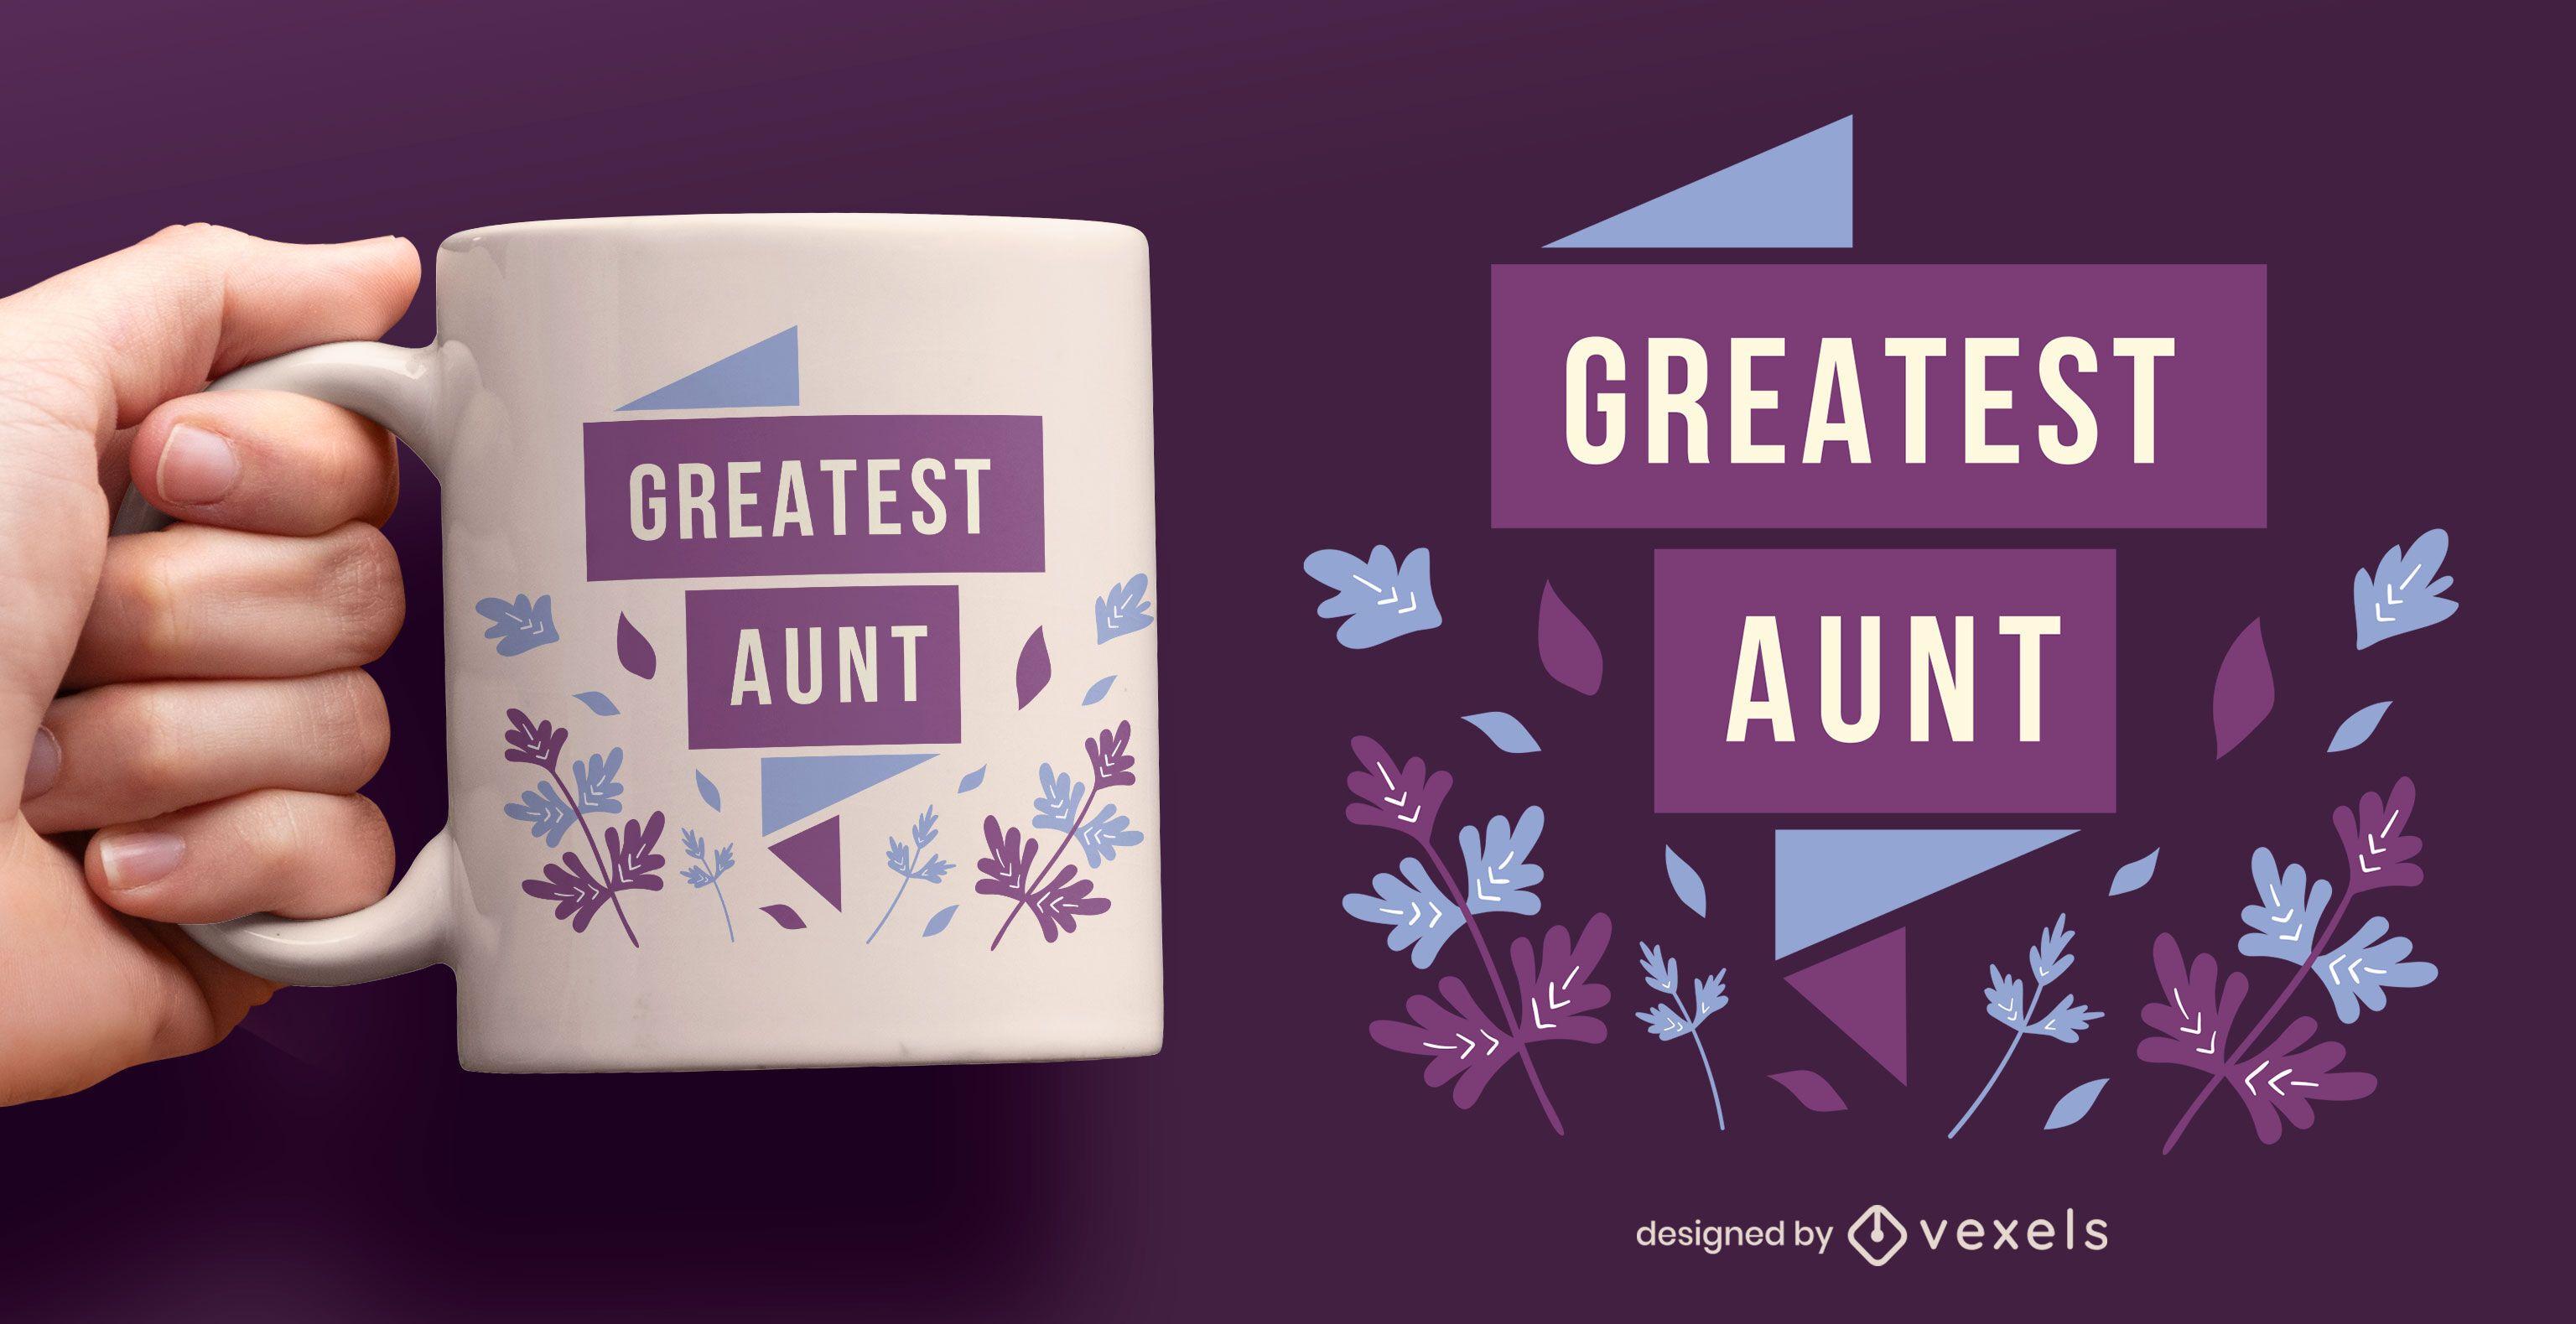 Greatest aunt flat mug design